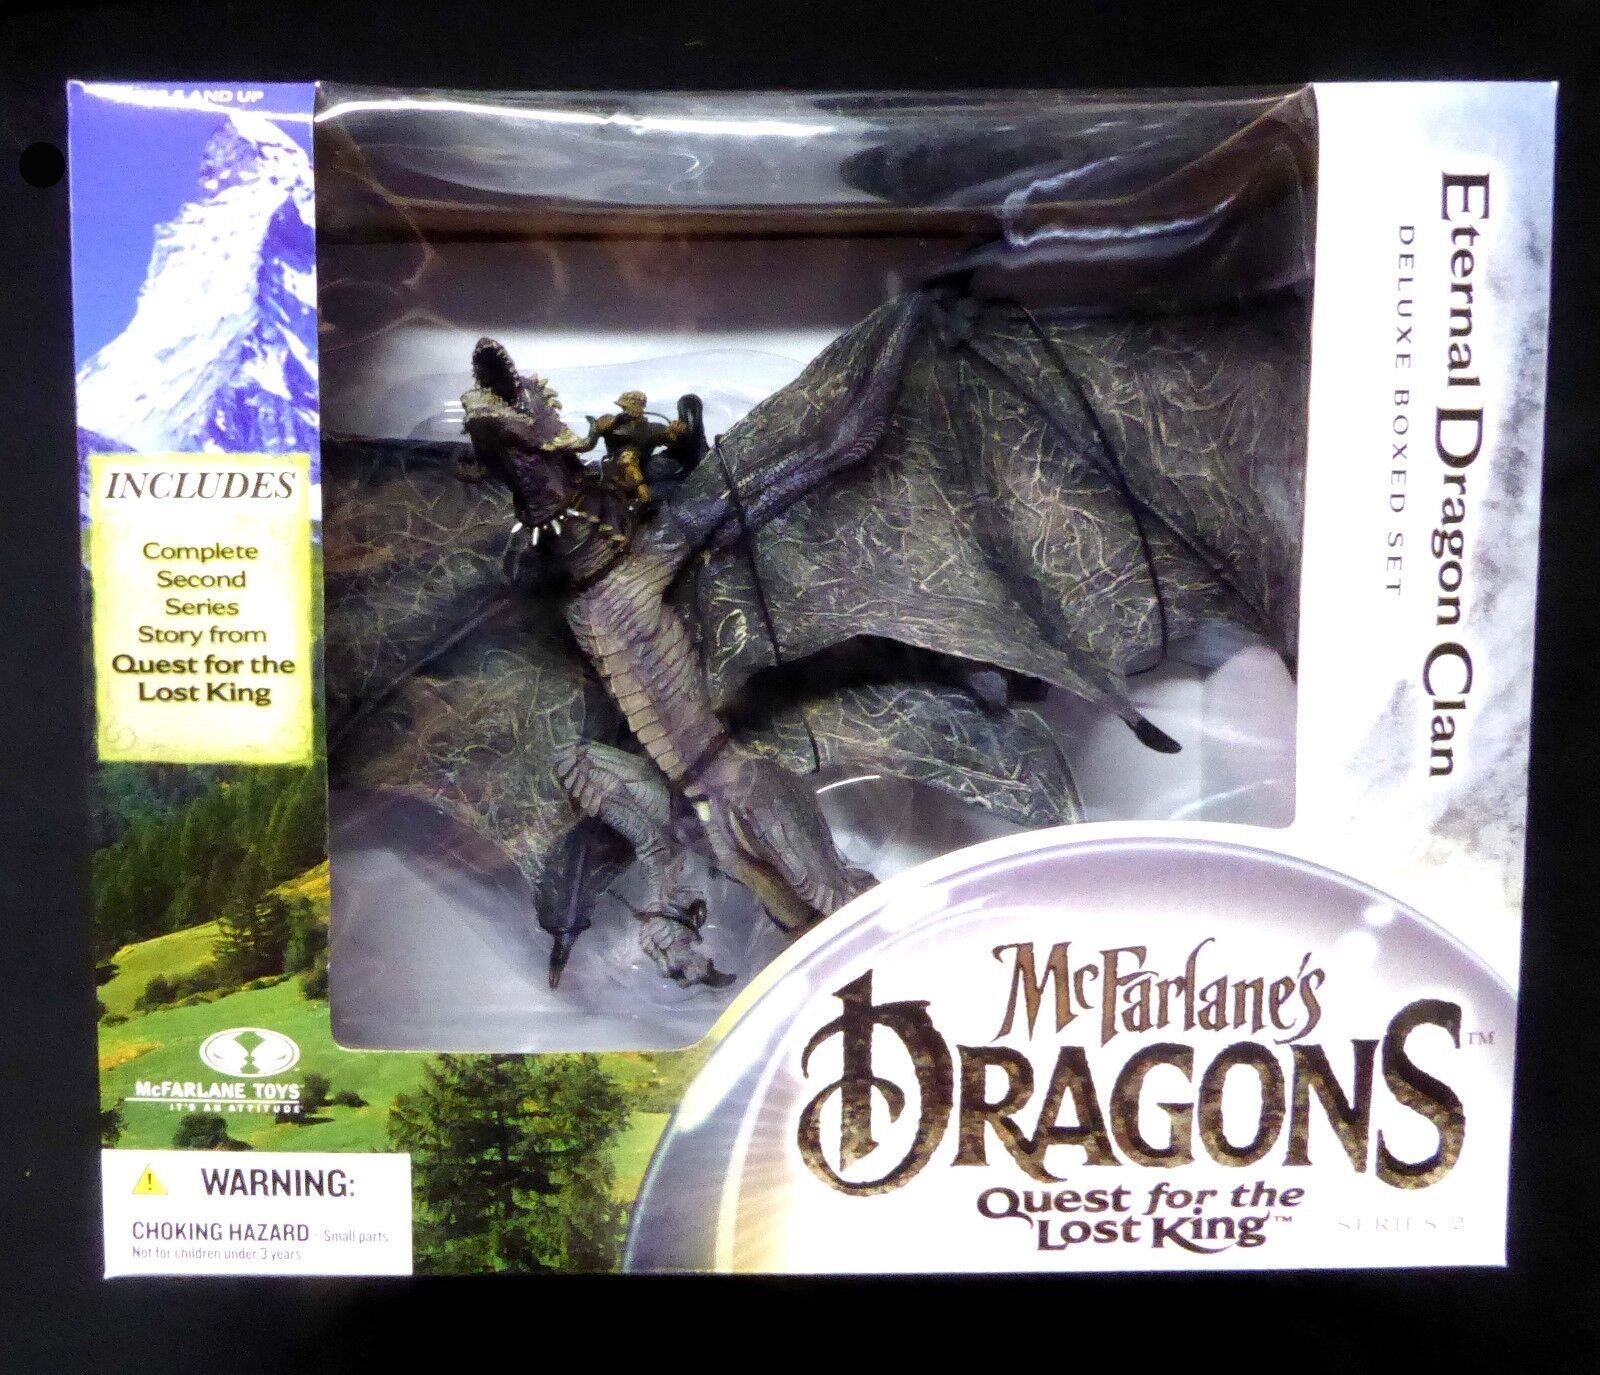 Drachen - serie 2 verloren könig den ewigen drachen box neu versiegelt mcfarlane spielzeug.